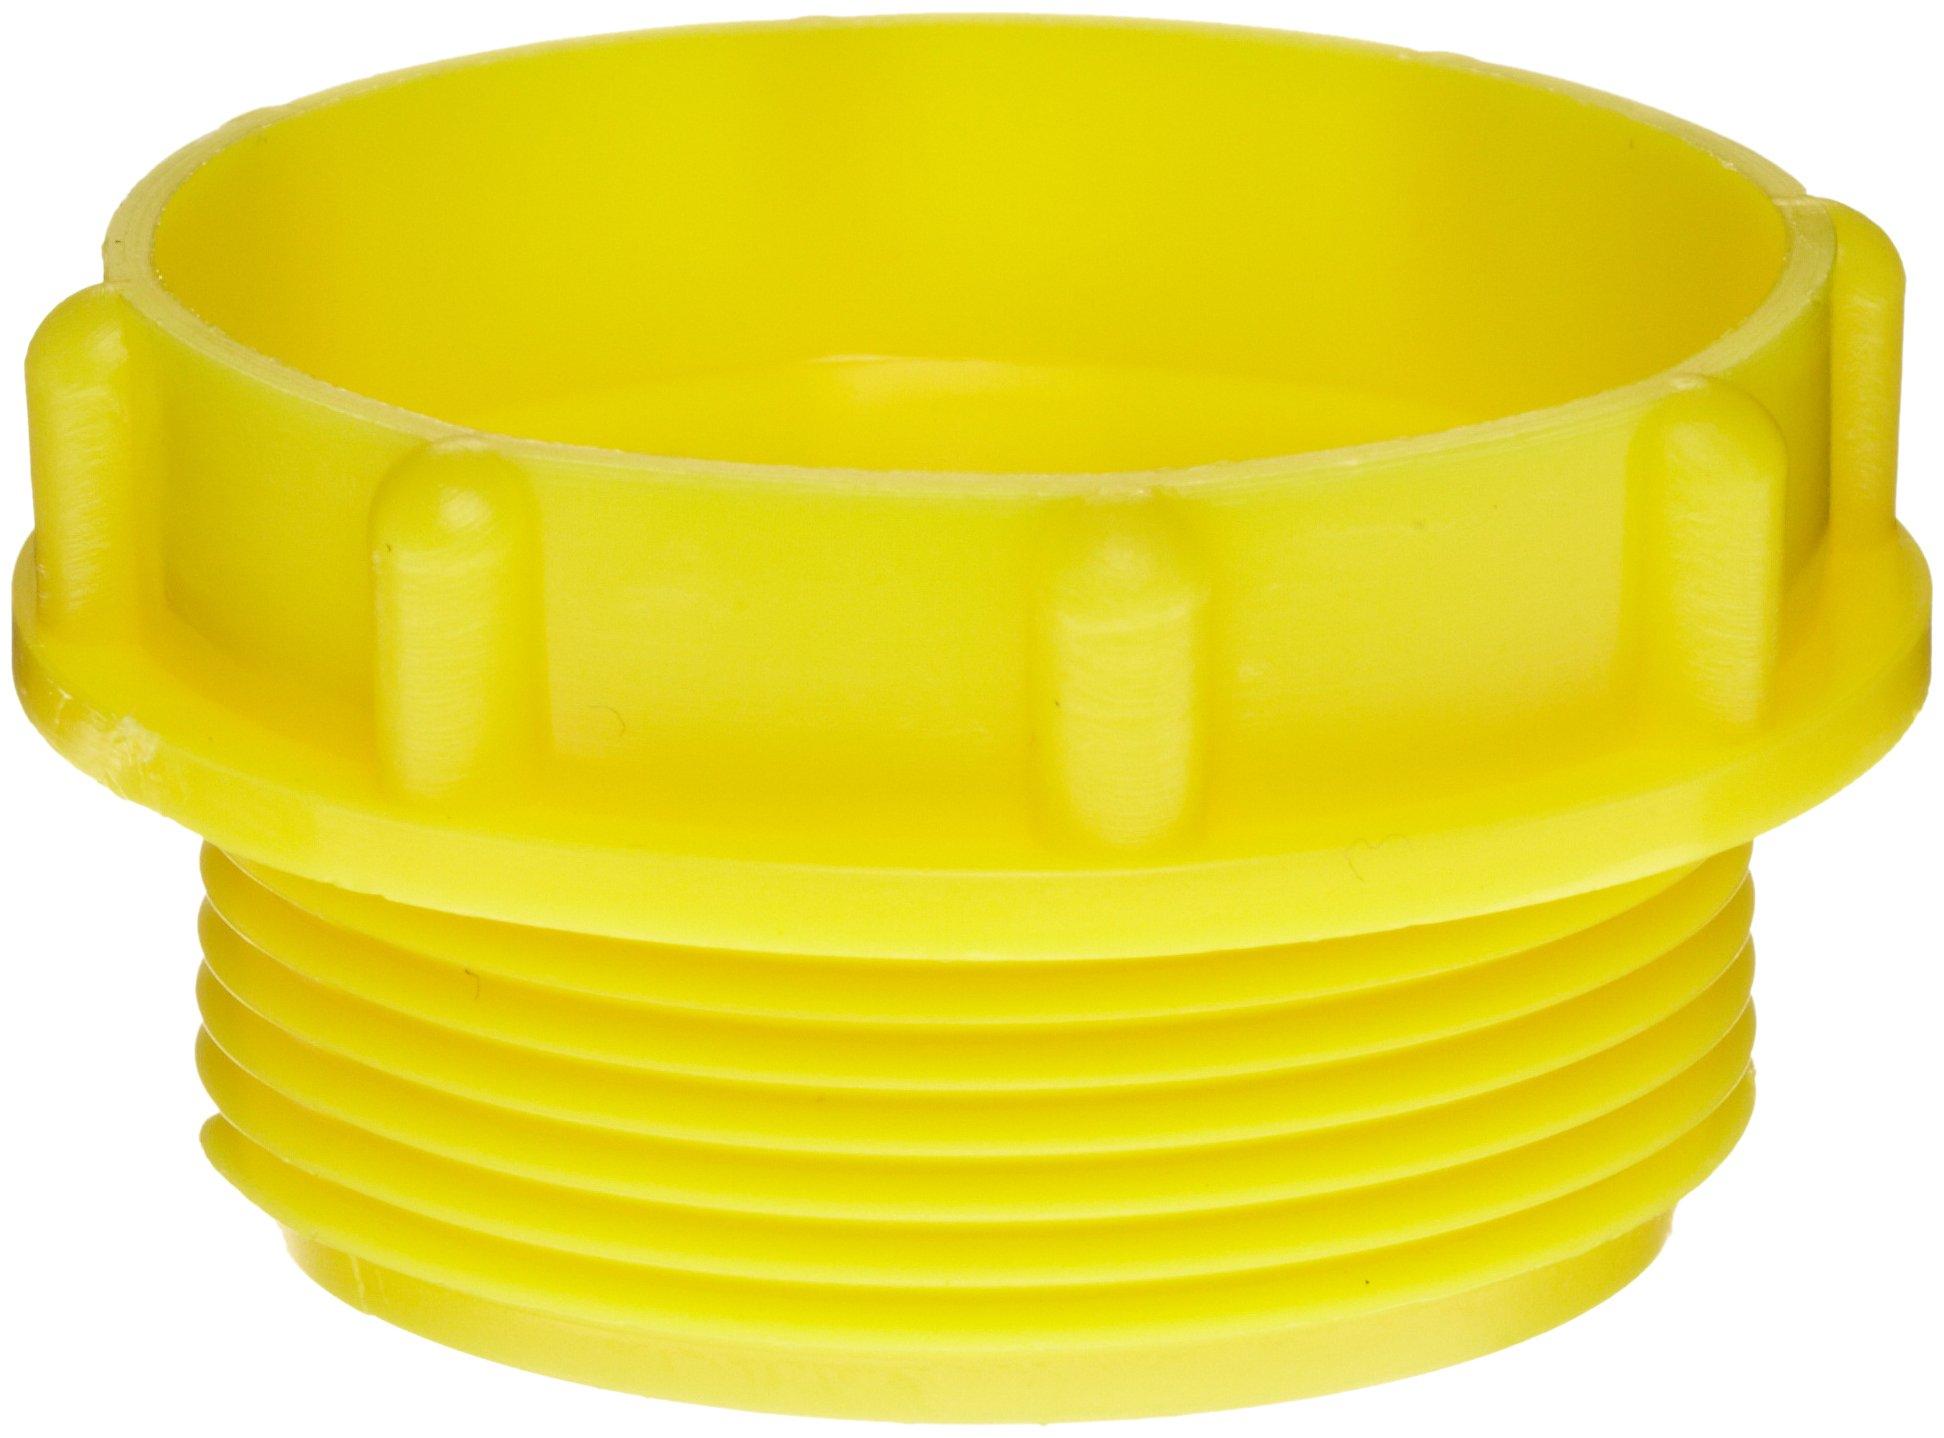 Kapsto 700 M 36 x 1.5 Polyethylene Screw Plug, Yellow, 44 mm Tube OD (Pack of 100)